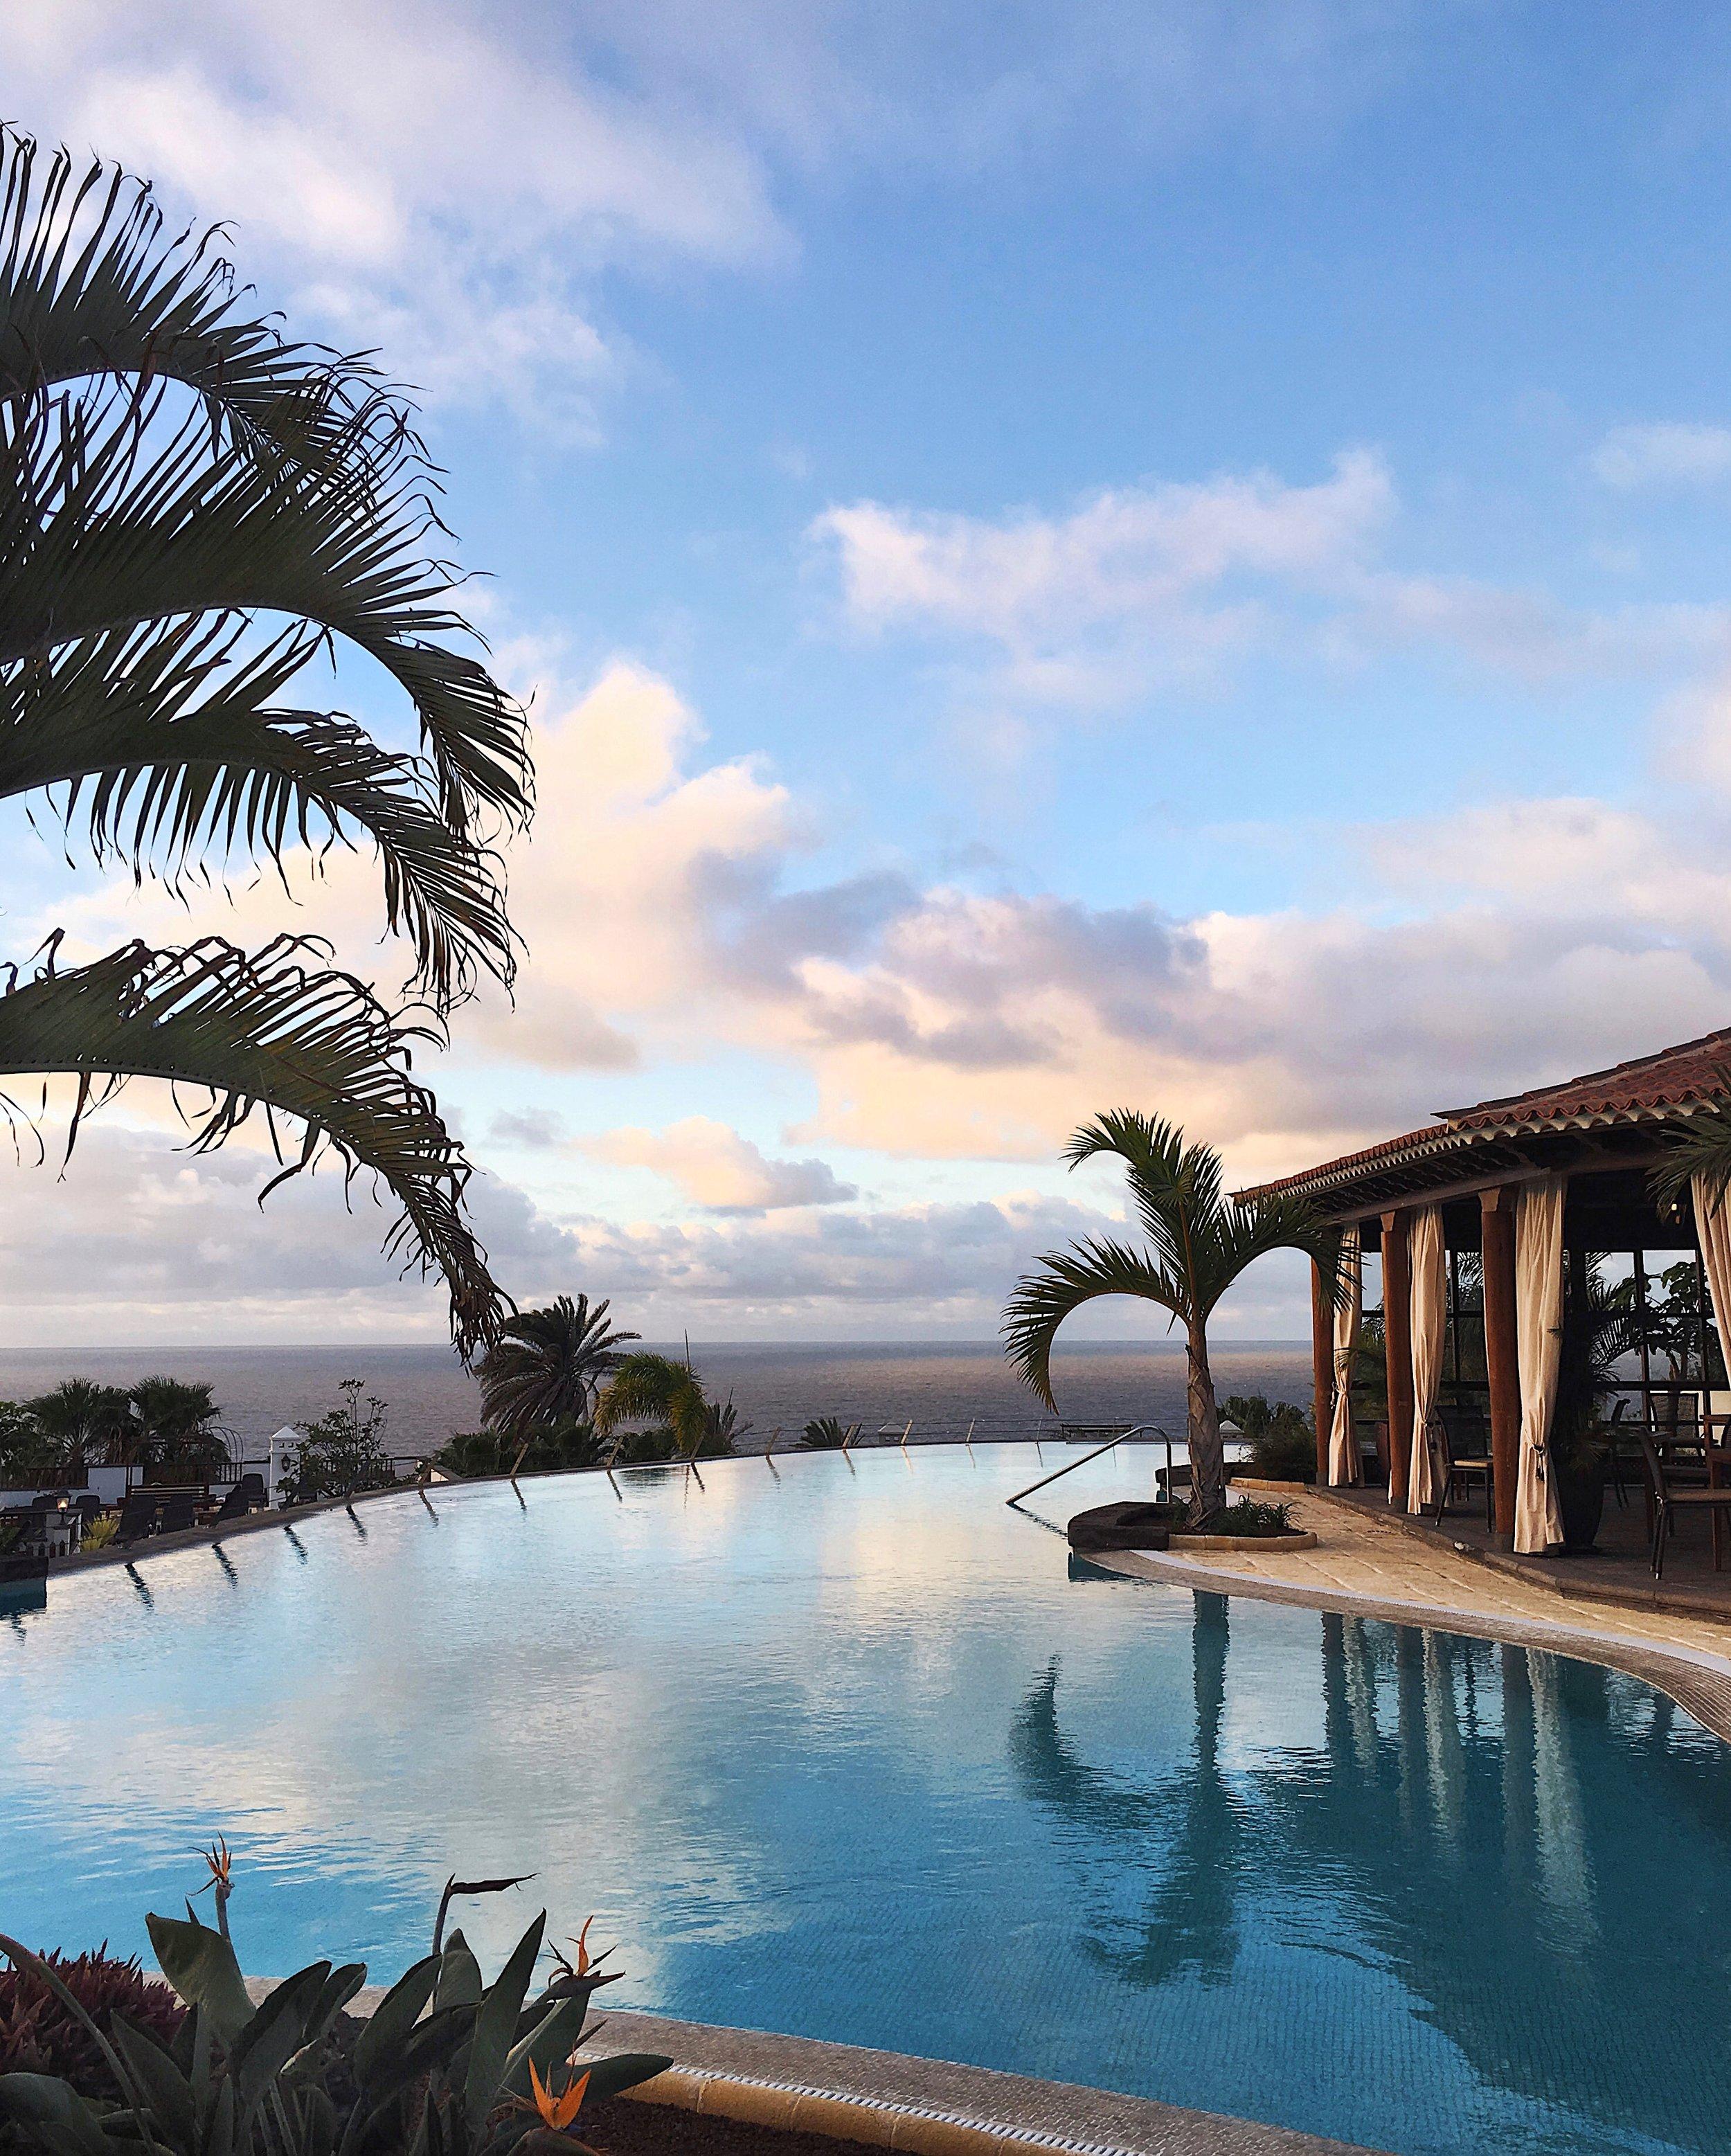 Melia Hotels - Tenerife